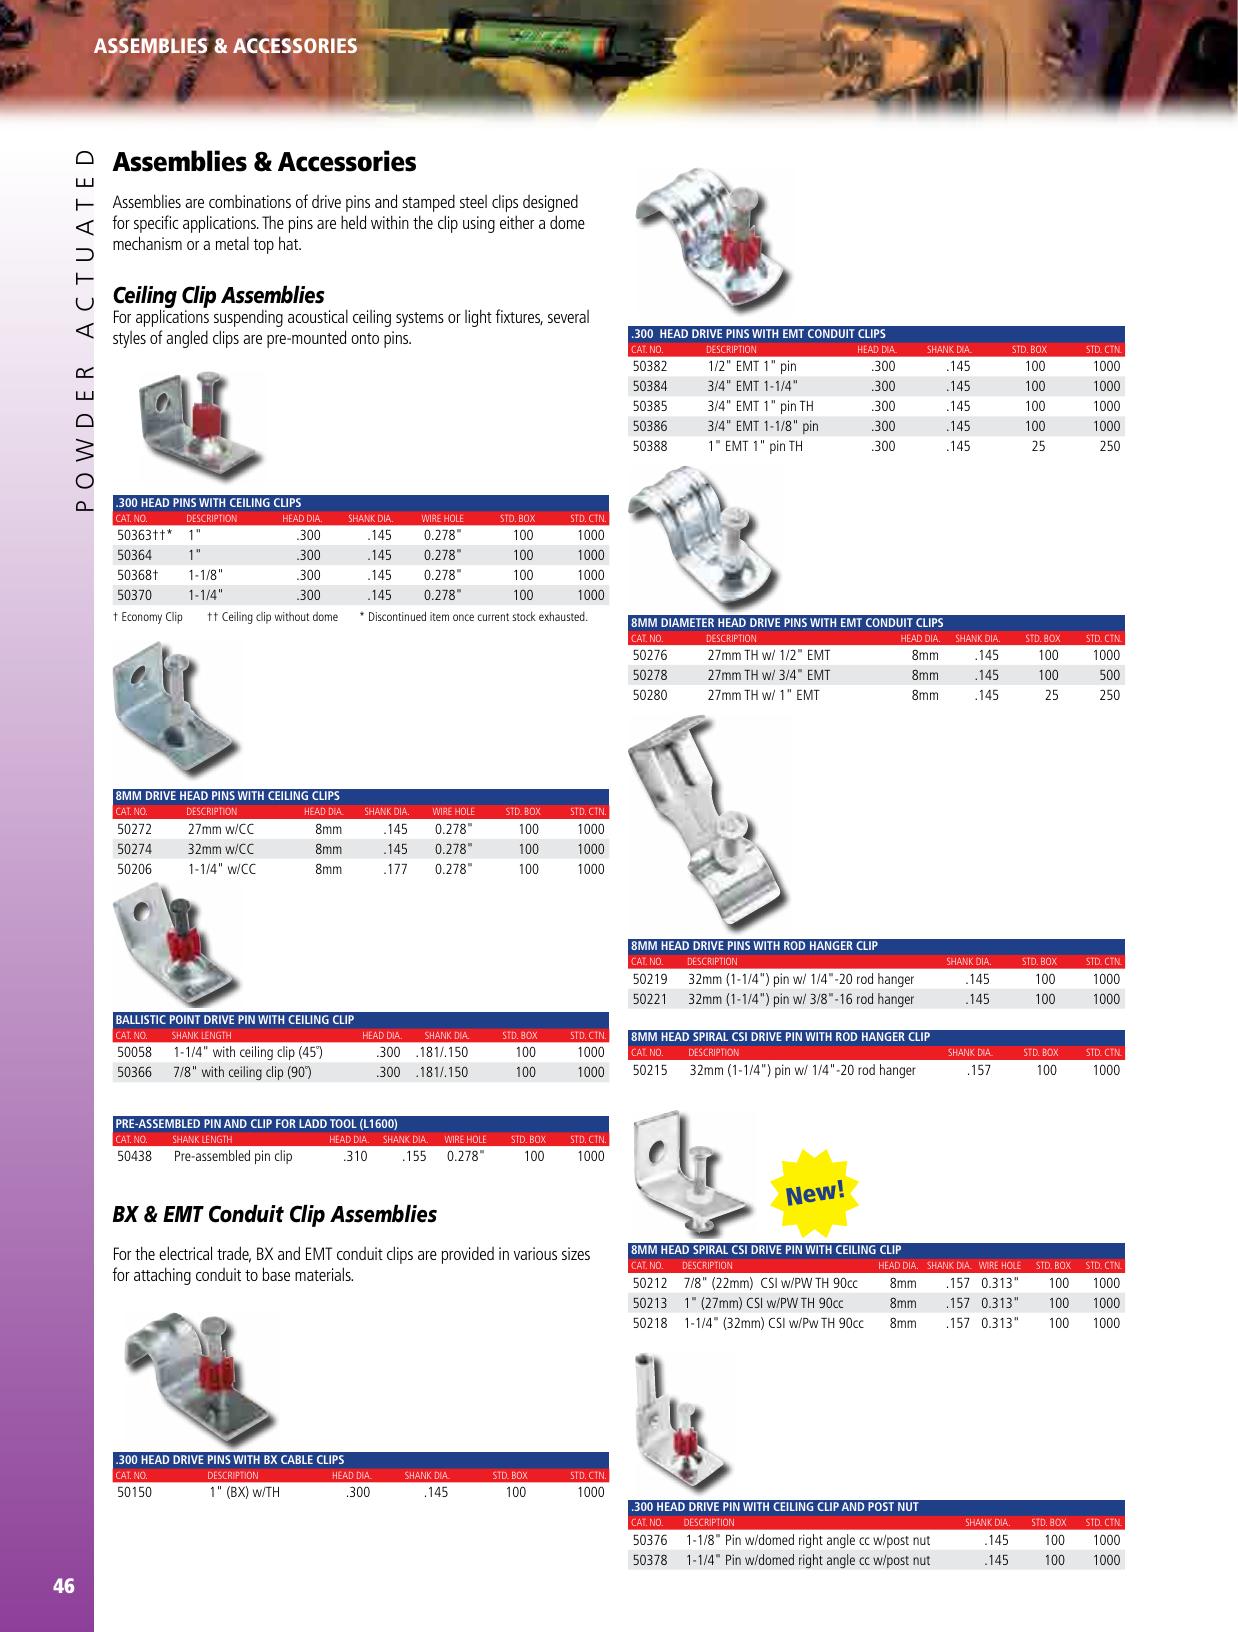 100 Per Box Powers Fastening Innovations 50198 Drive Pin 57-Millimeter 2-1//4-Inch Length 8-Millimeter Head 0.145 Shank Diameter X-Dn Type Pins